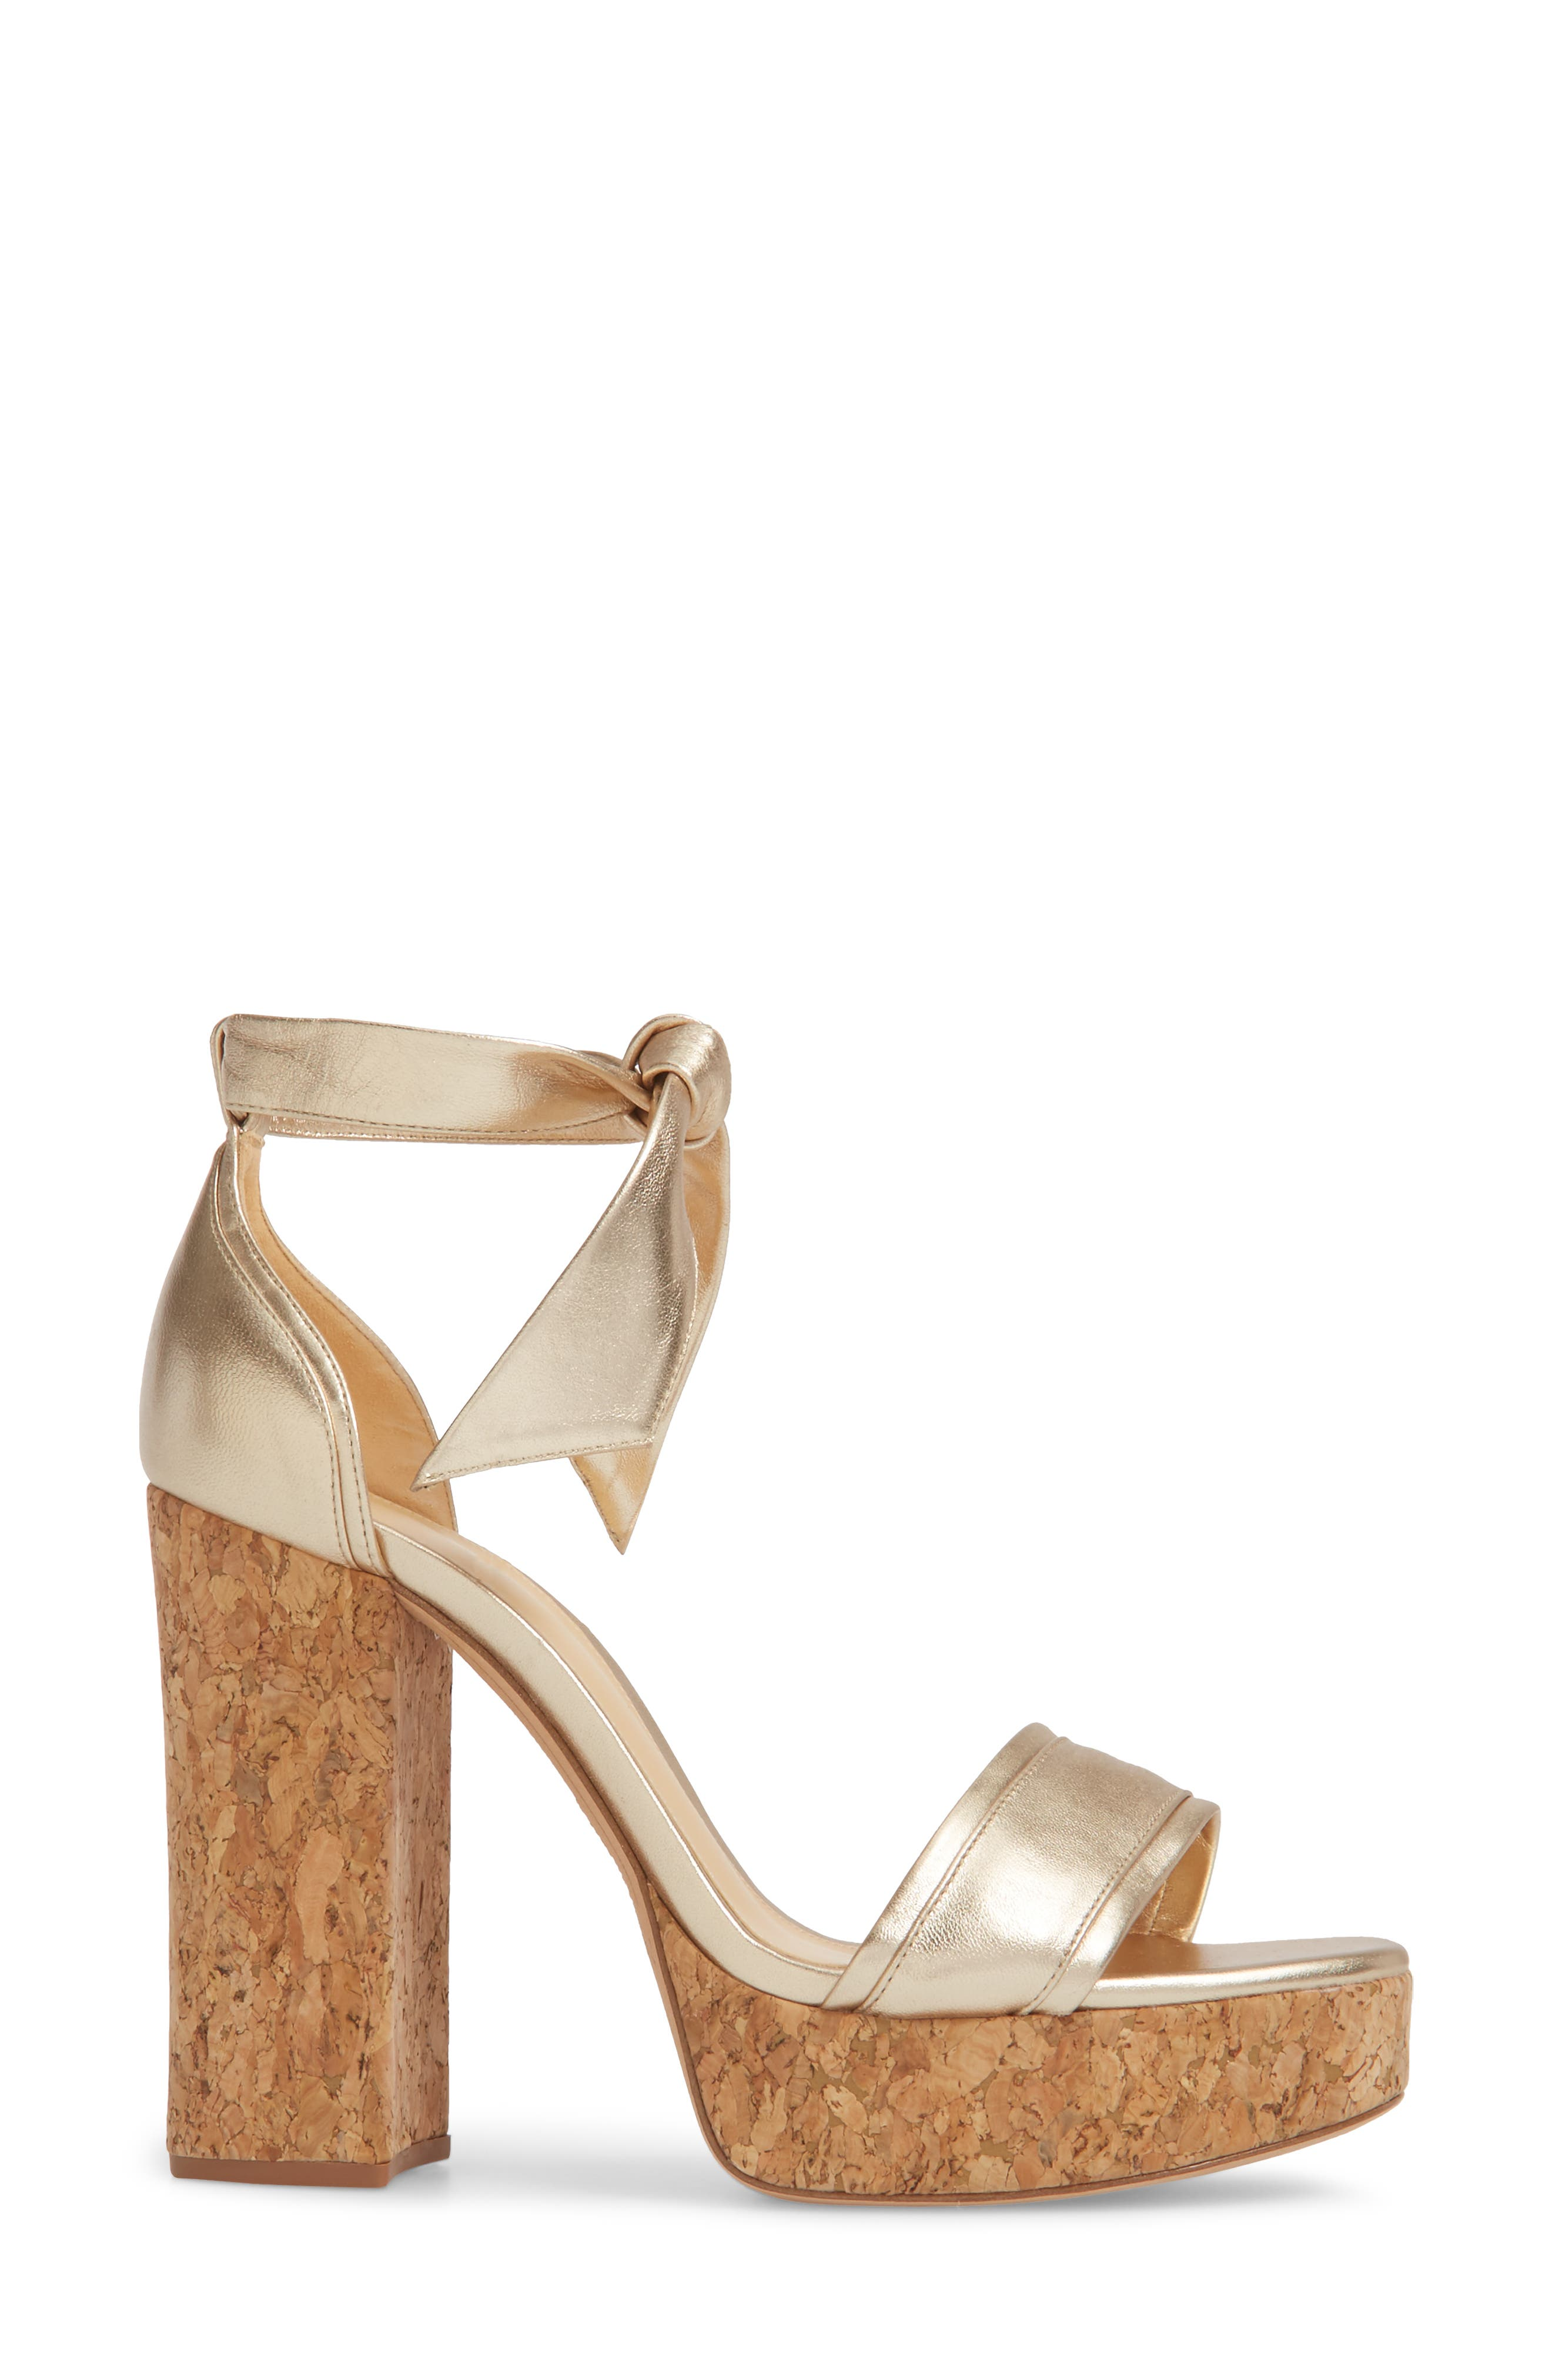 Celine Ankle Tie Platform Sandal,                             Alternate thumbnail 3, color,                             Gold